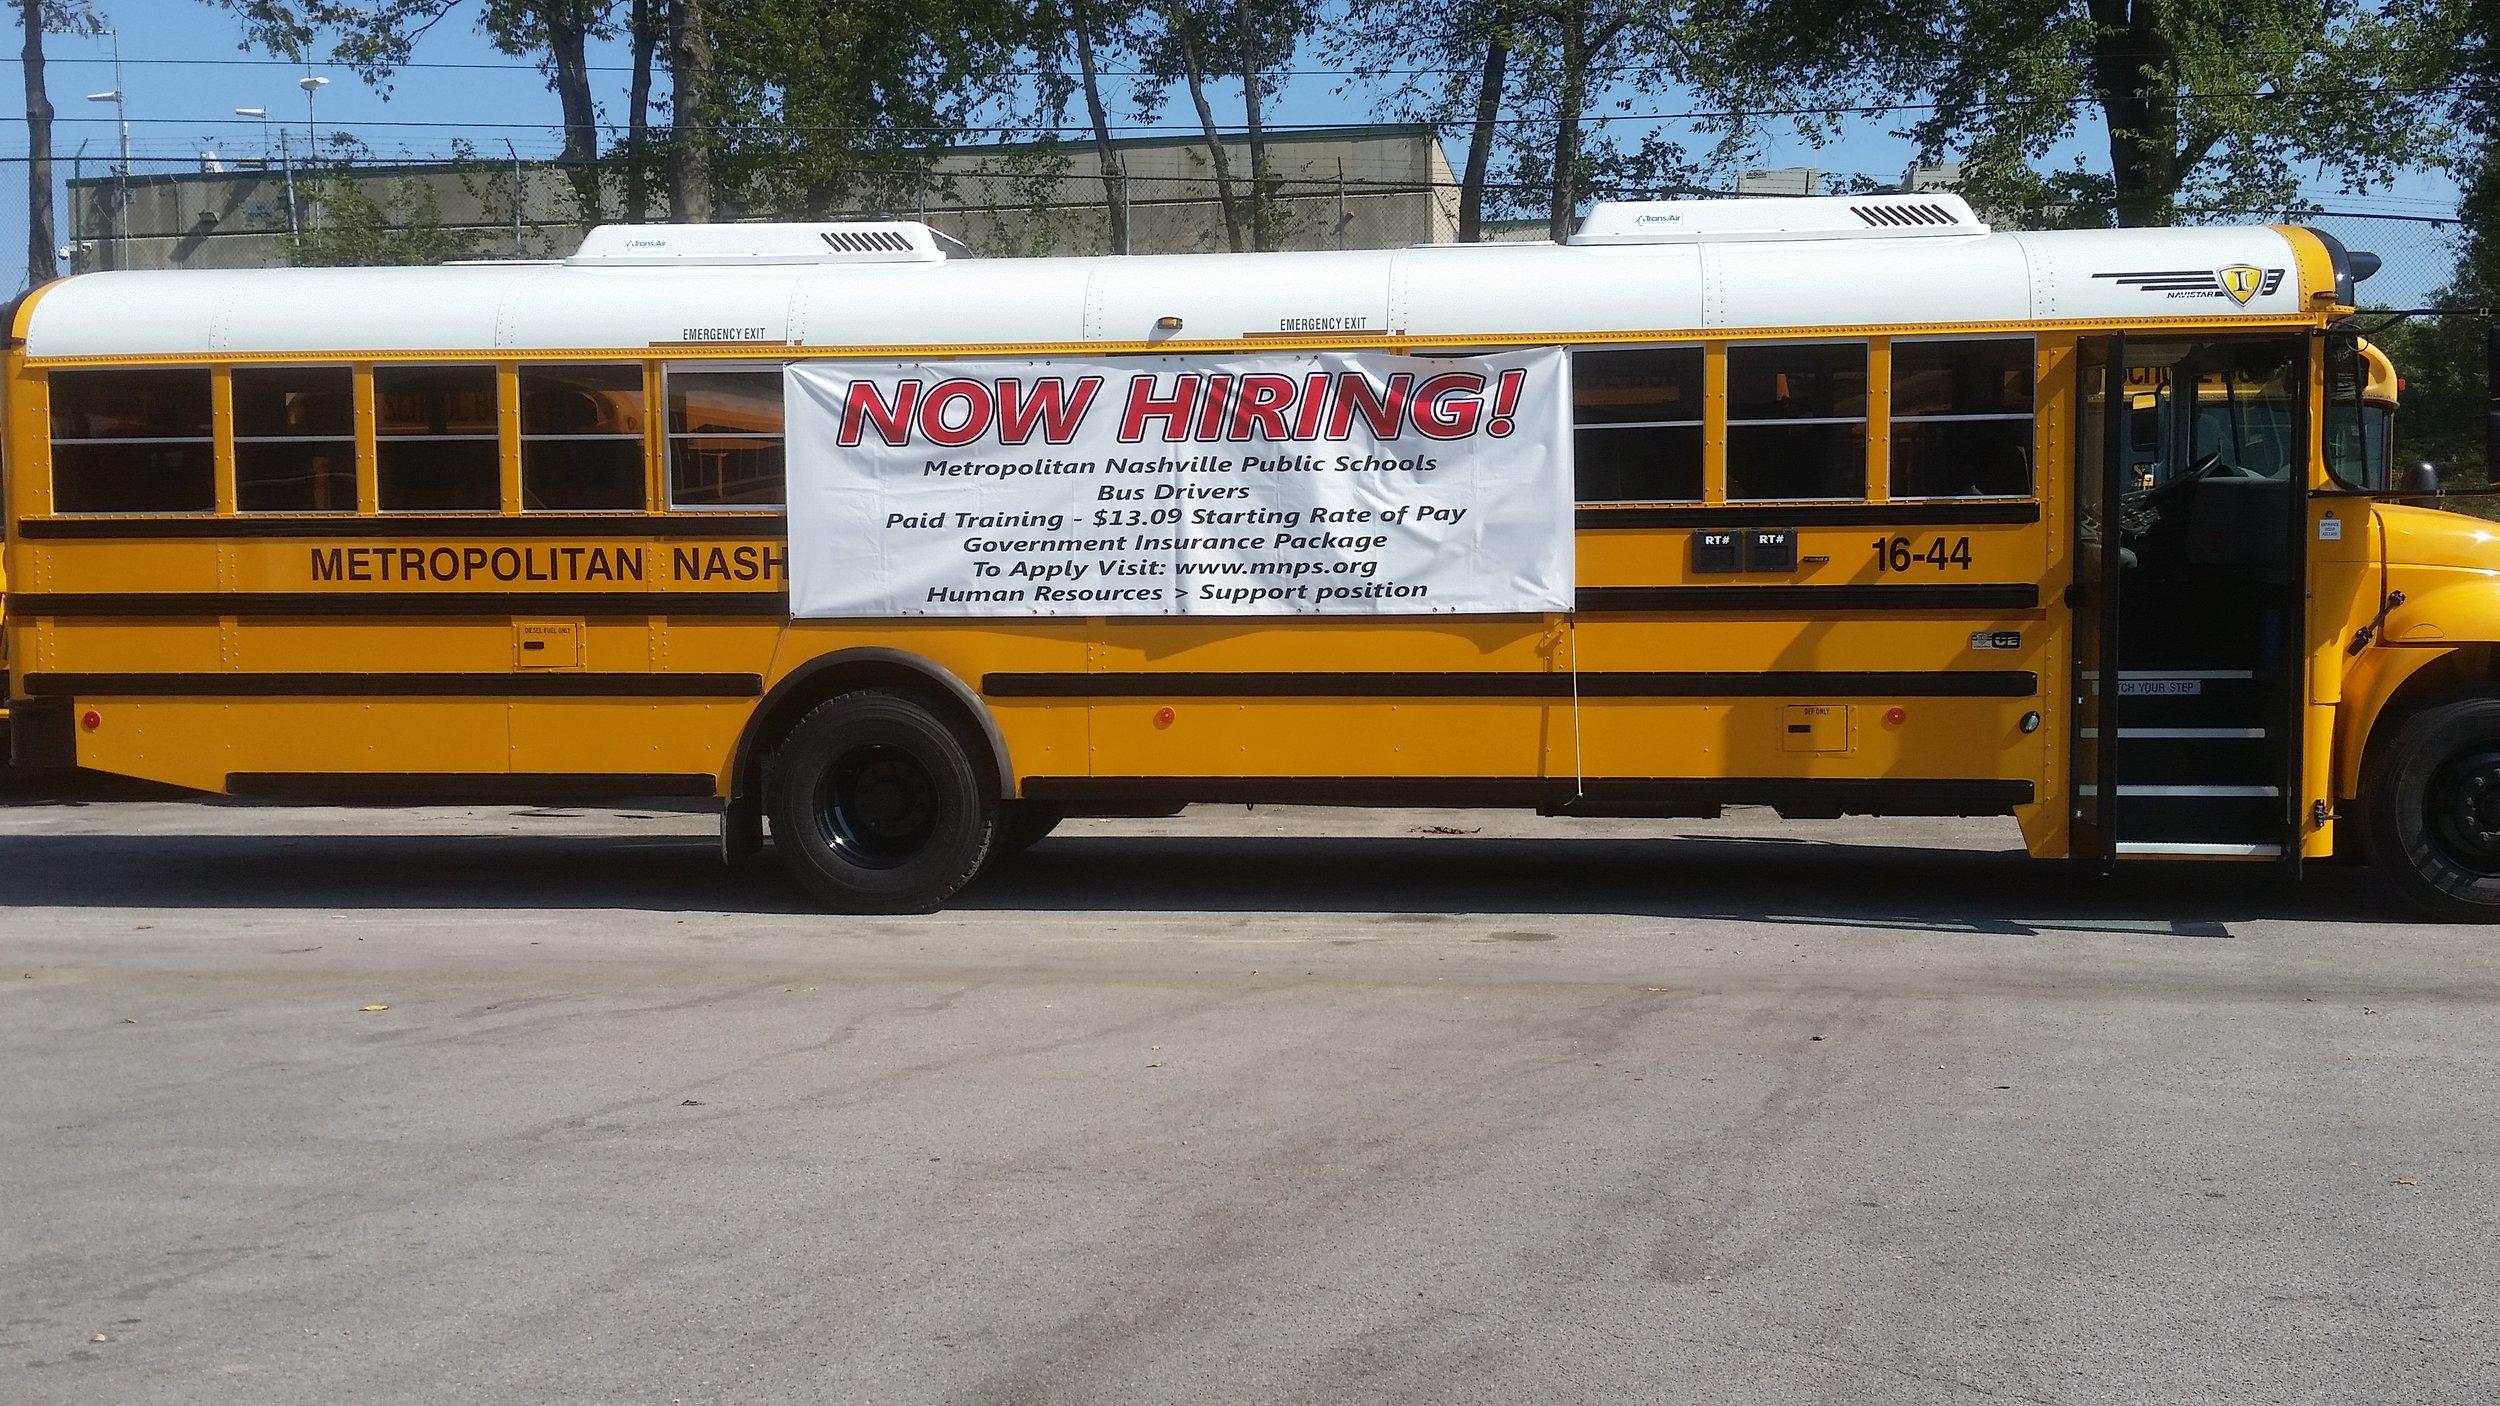 BusDrivers-NowHiringNashvillepublicSchools